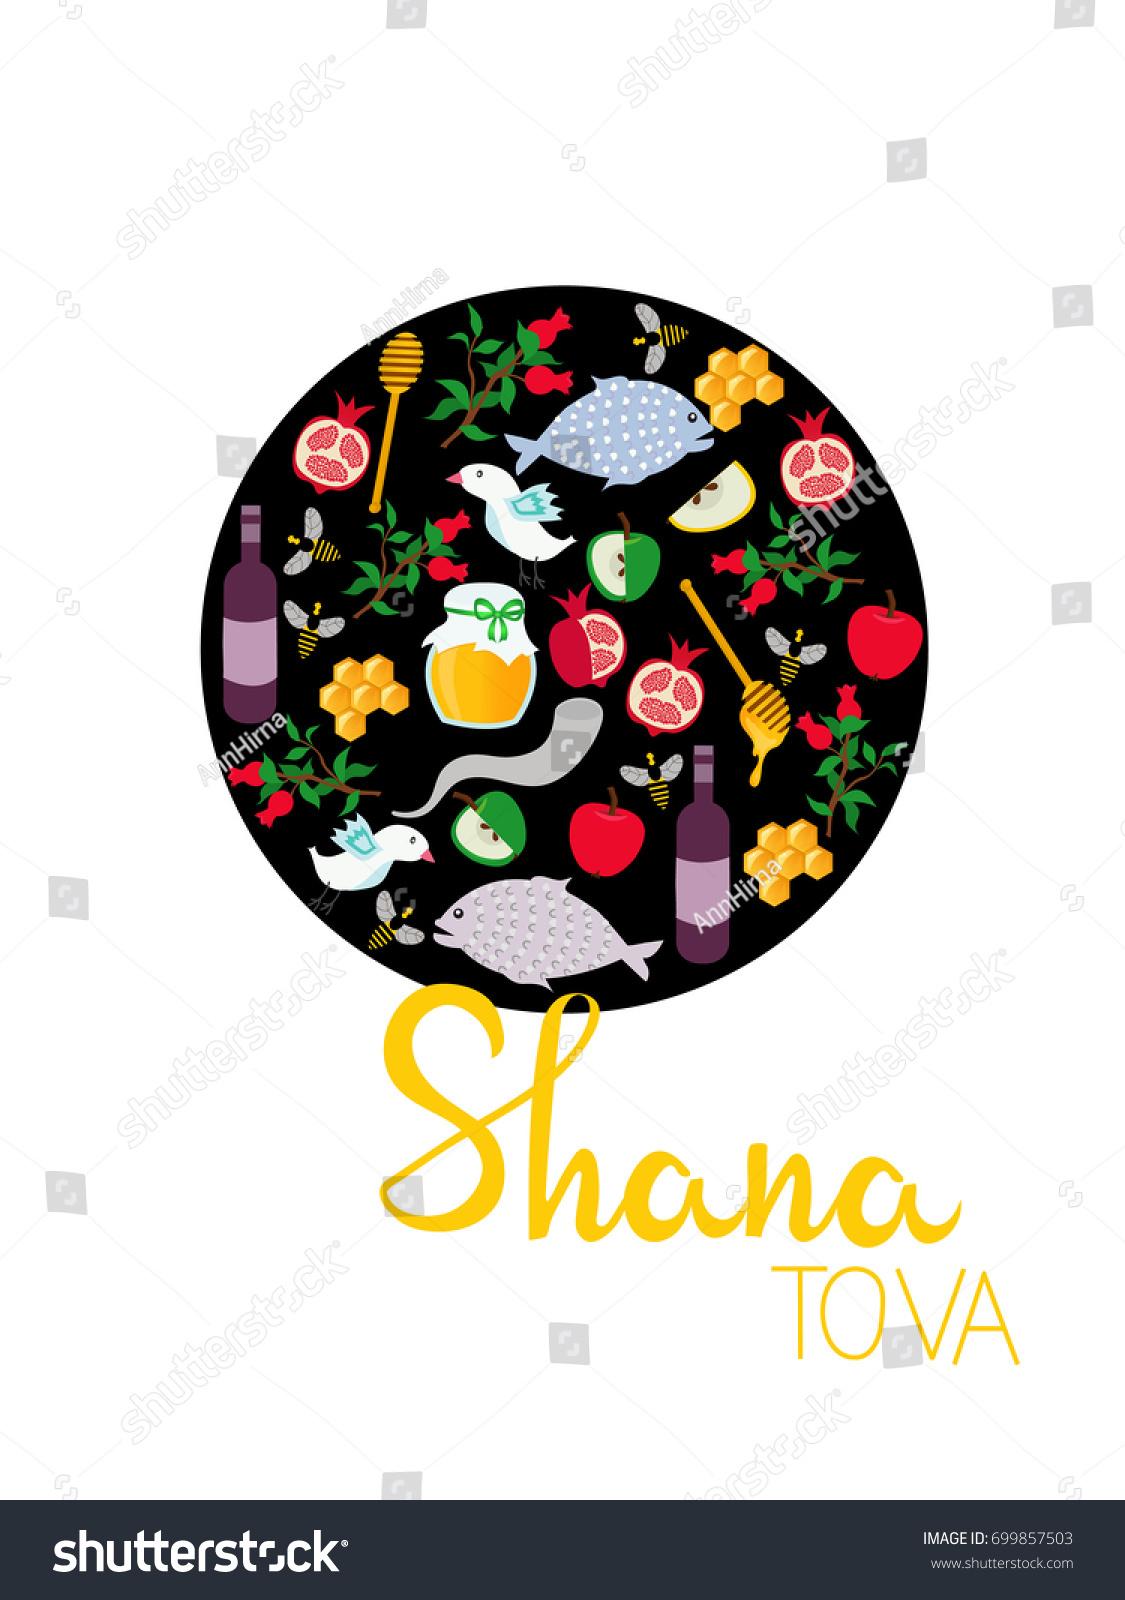 Greeting card jewish new year traditional stock vector 699857503 greeting card for jewish new year with traditional elements of holiday rosh hashanah shana tova m4hsunfo